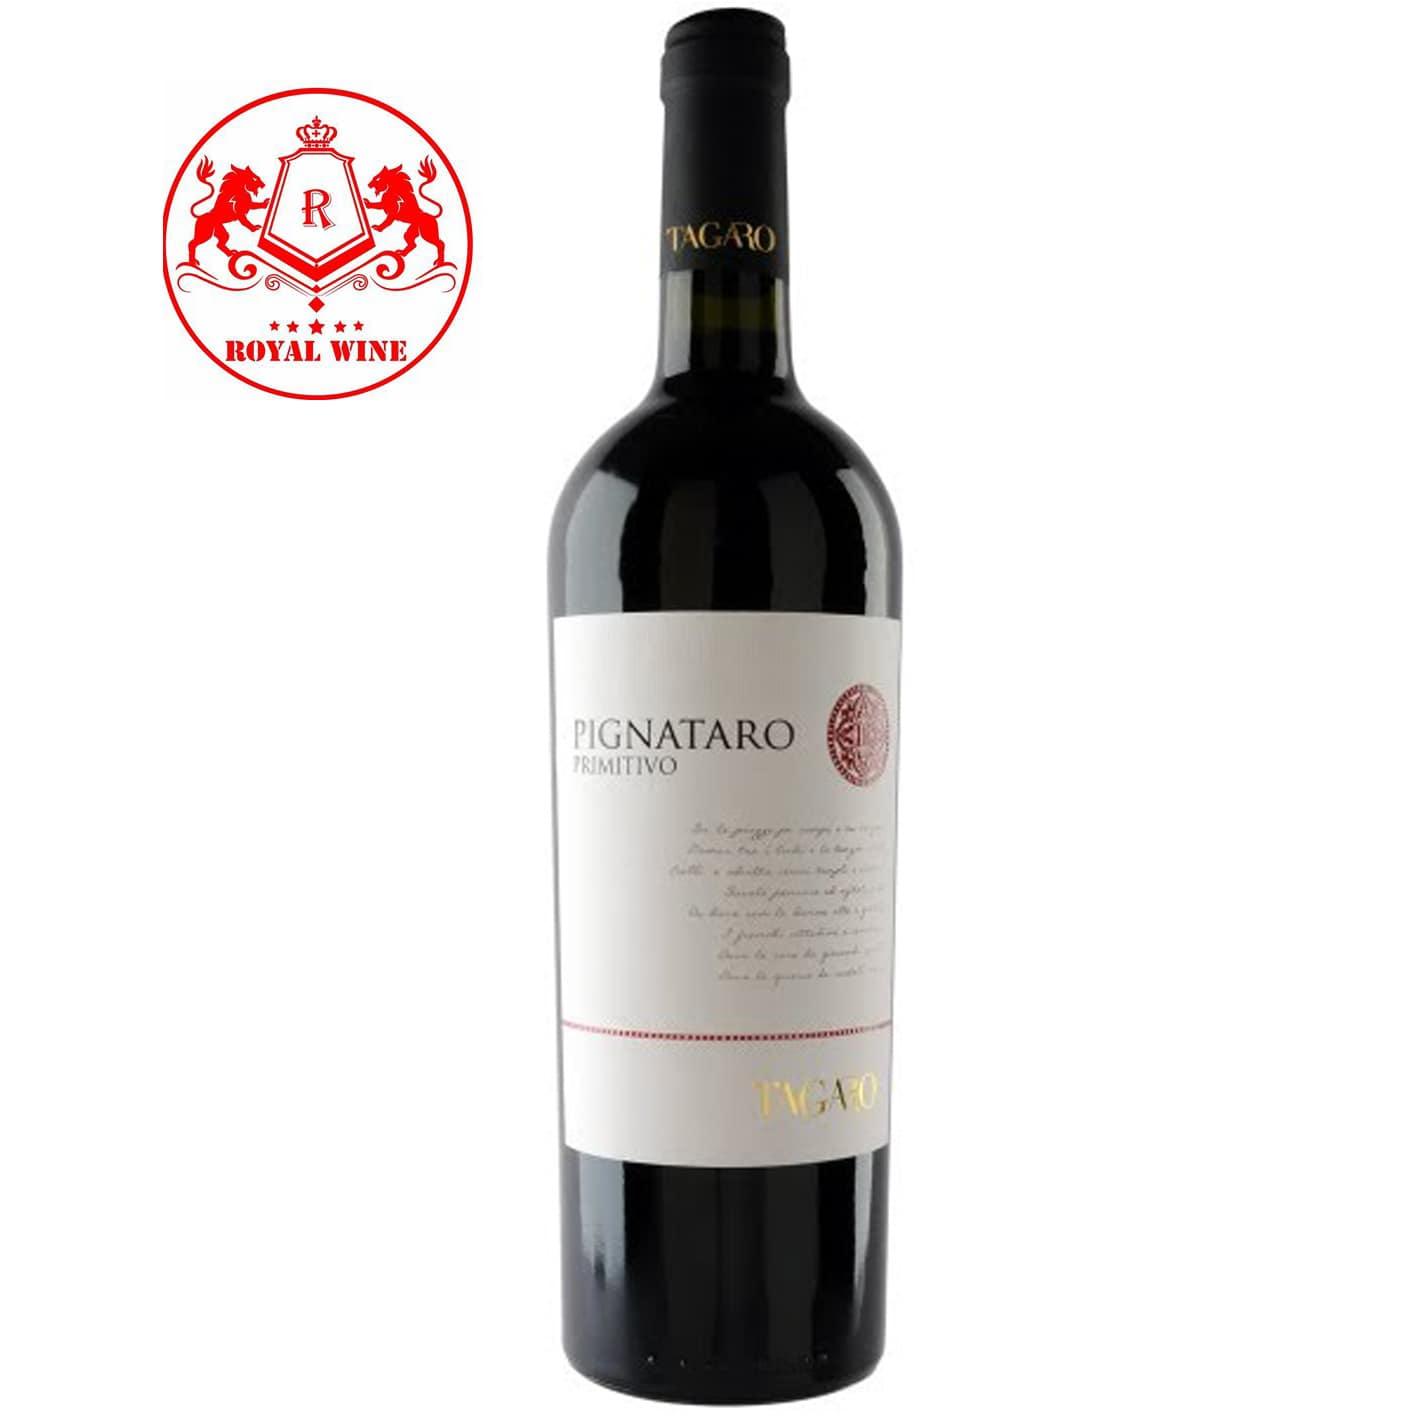 Rượu vang PIGNATARO Primitivo Tagaro